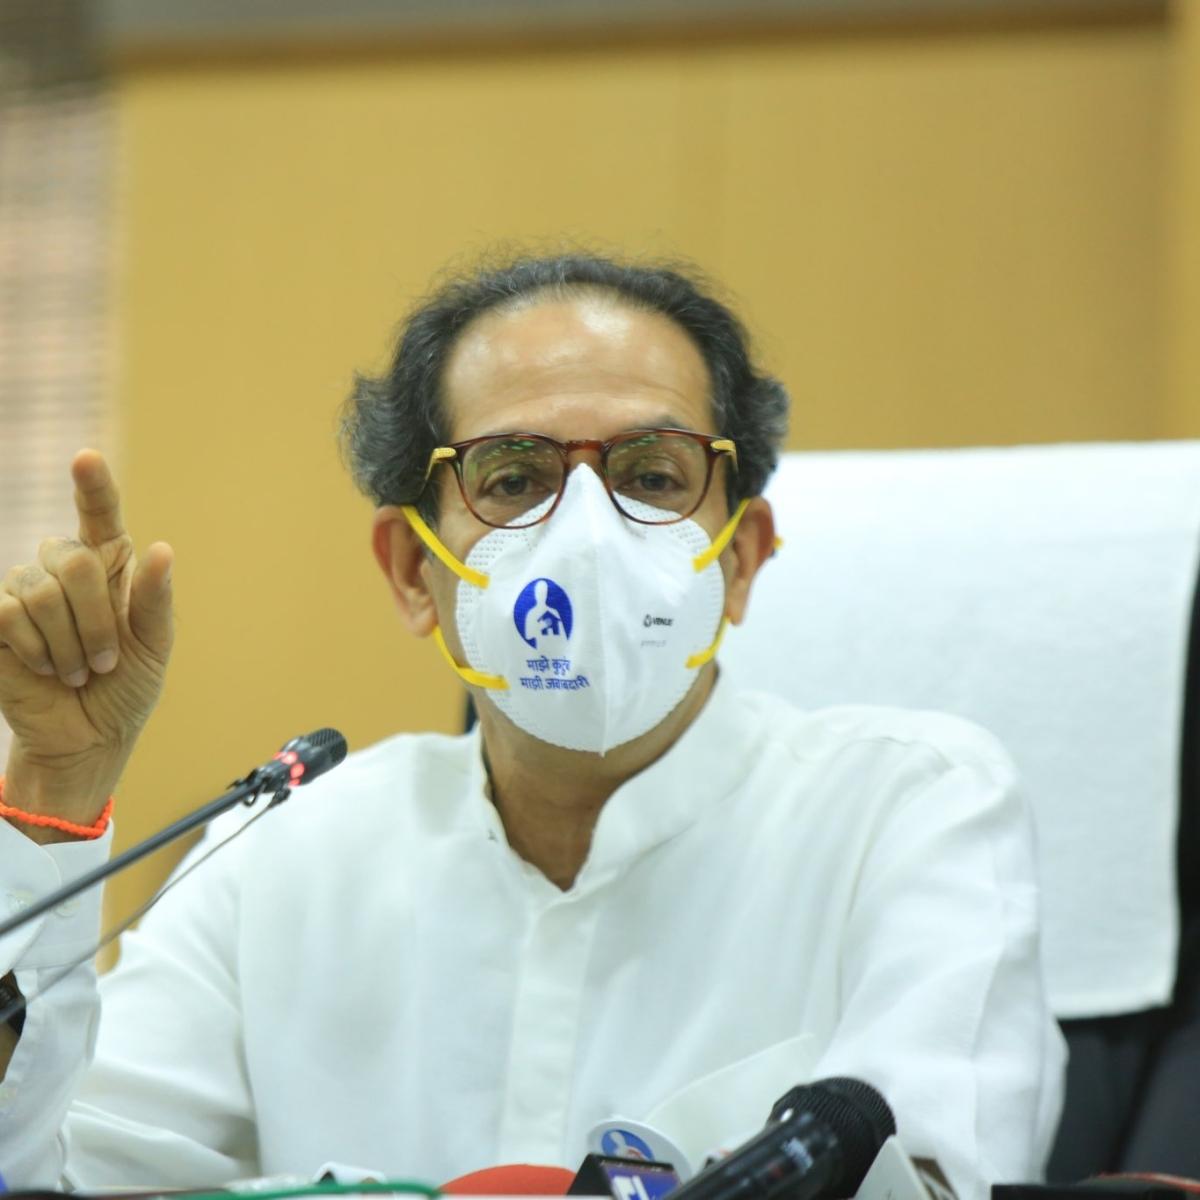 Uddhav Thackeray directs administration to increase medical facilities; Maharashtra awaits decision on lockdown